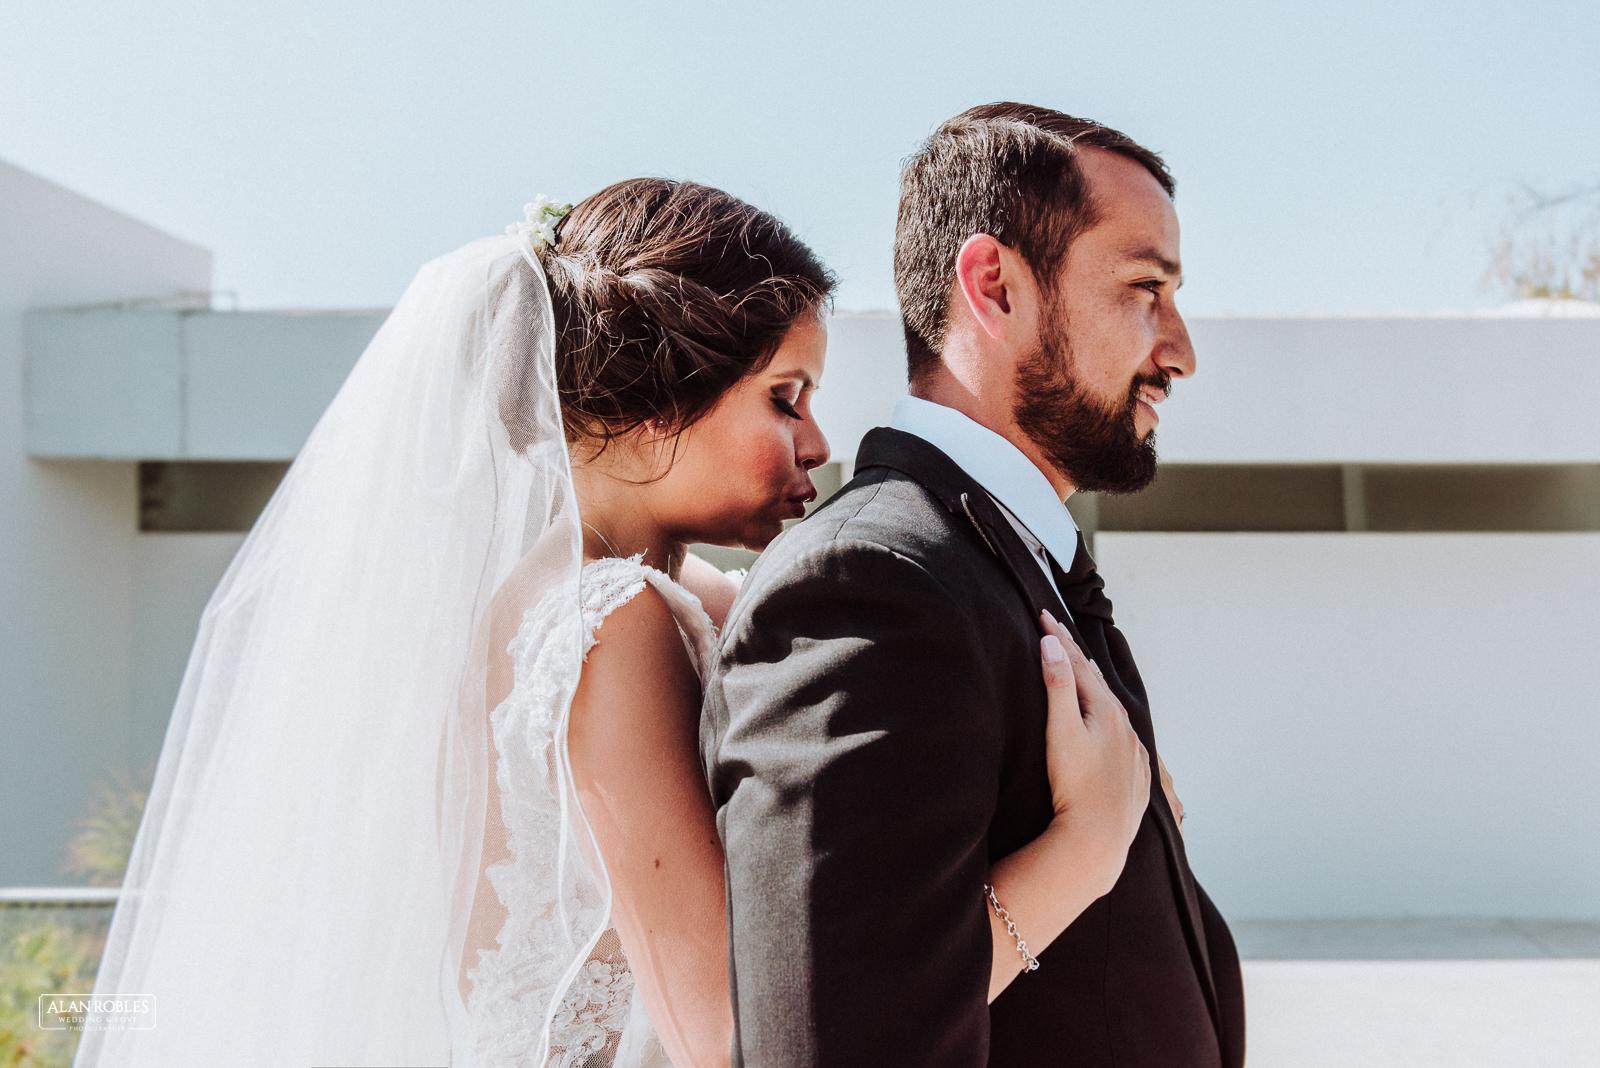 Fotografo de bodas Alan Robles-Boda en Guadalajara Real San Javier-31